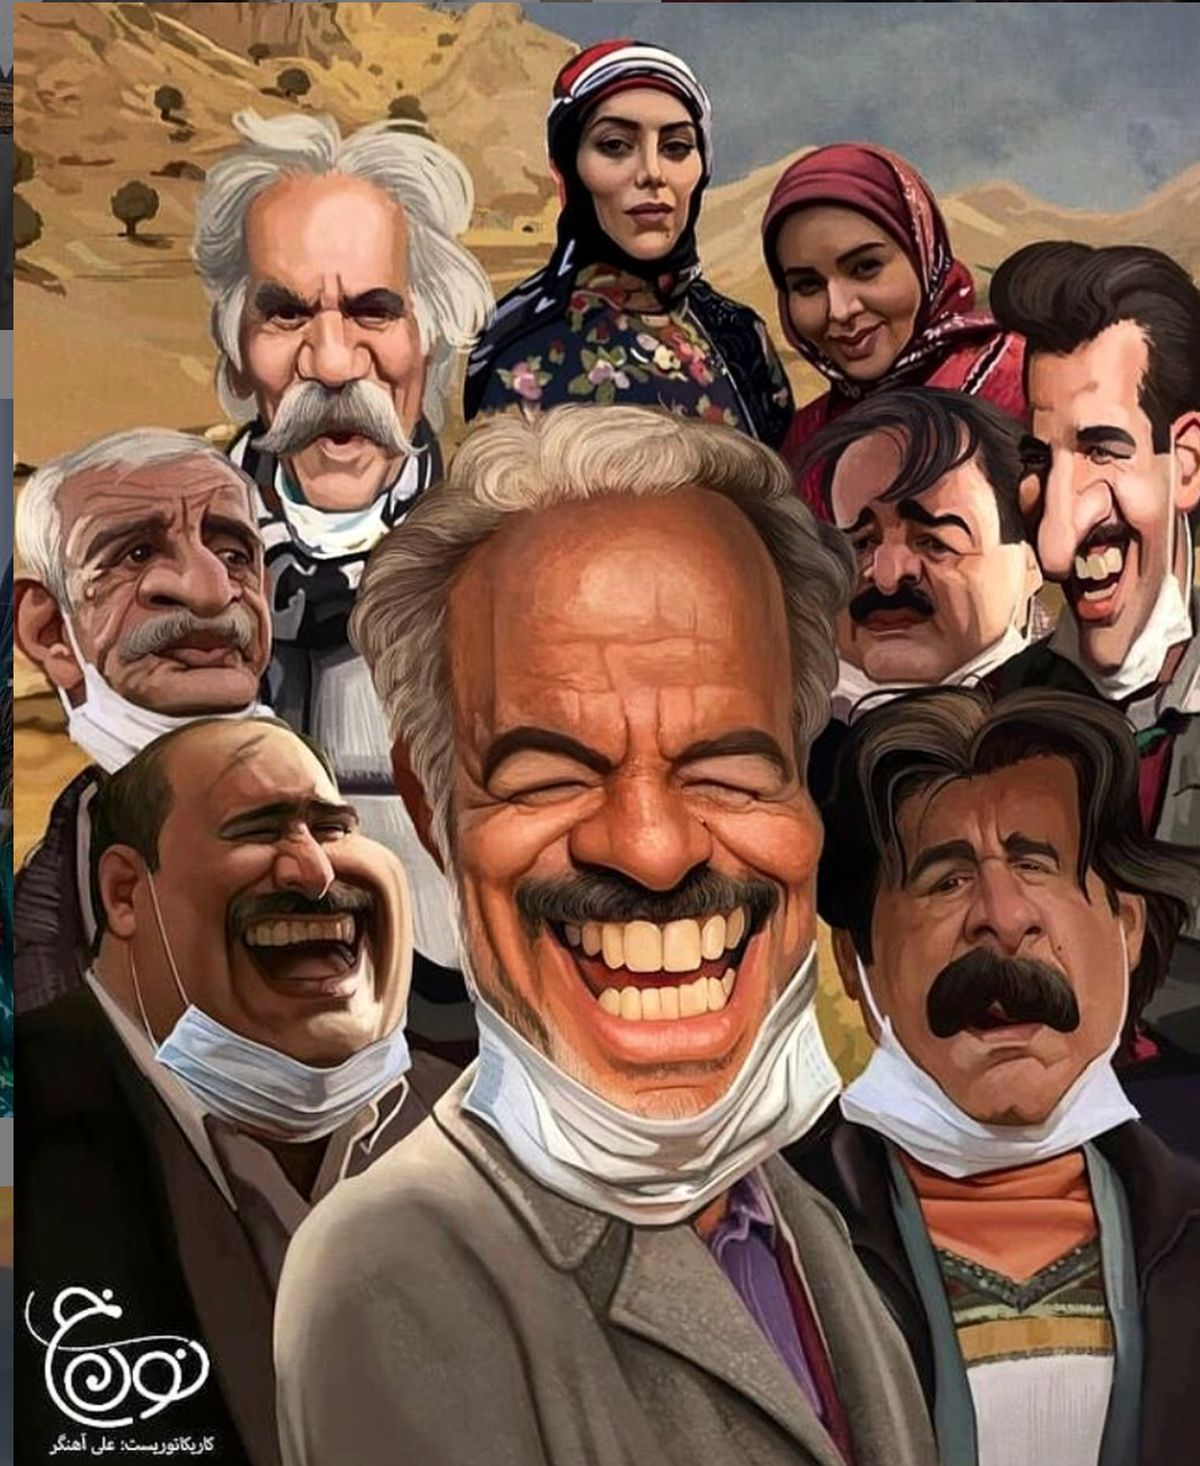 سعید آقاخانی: طرح اولیه سریال نون خ در تهران